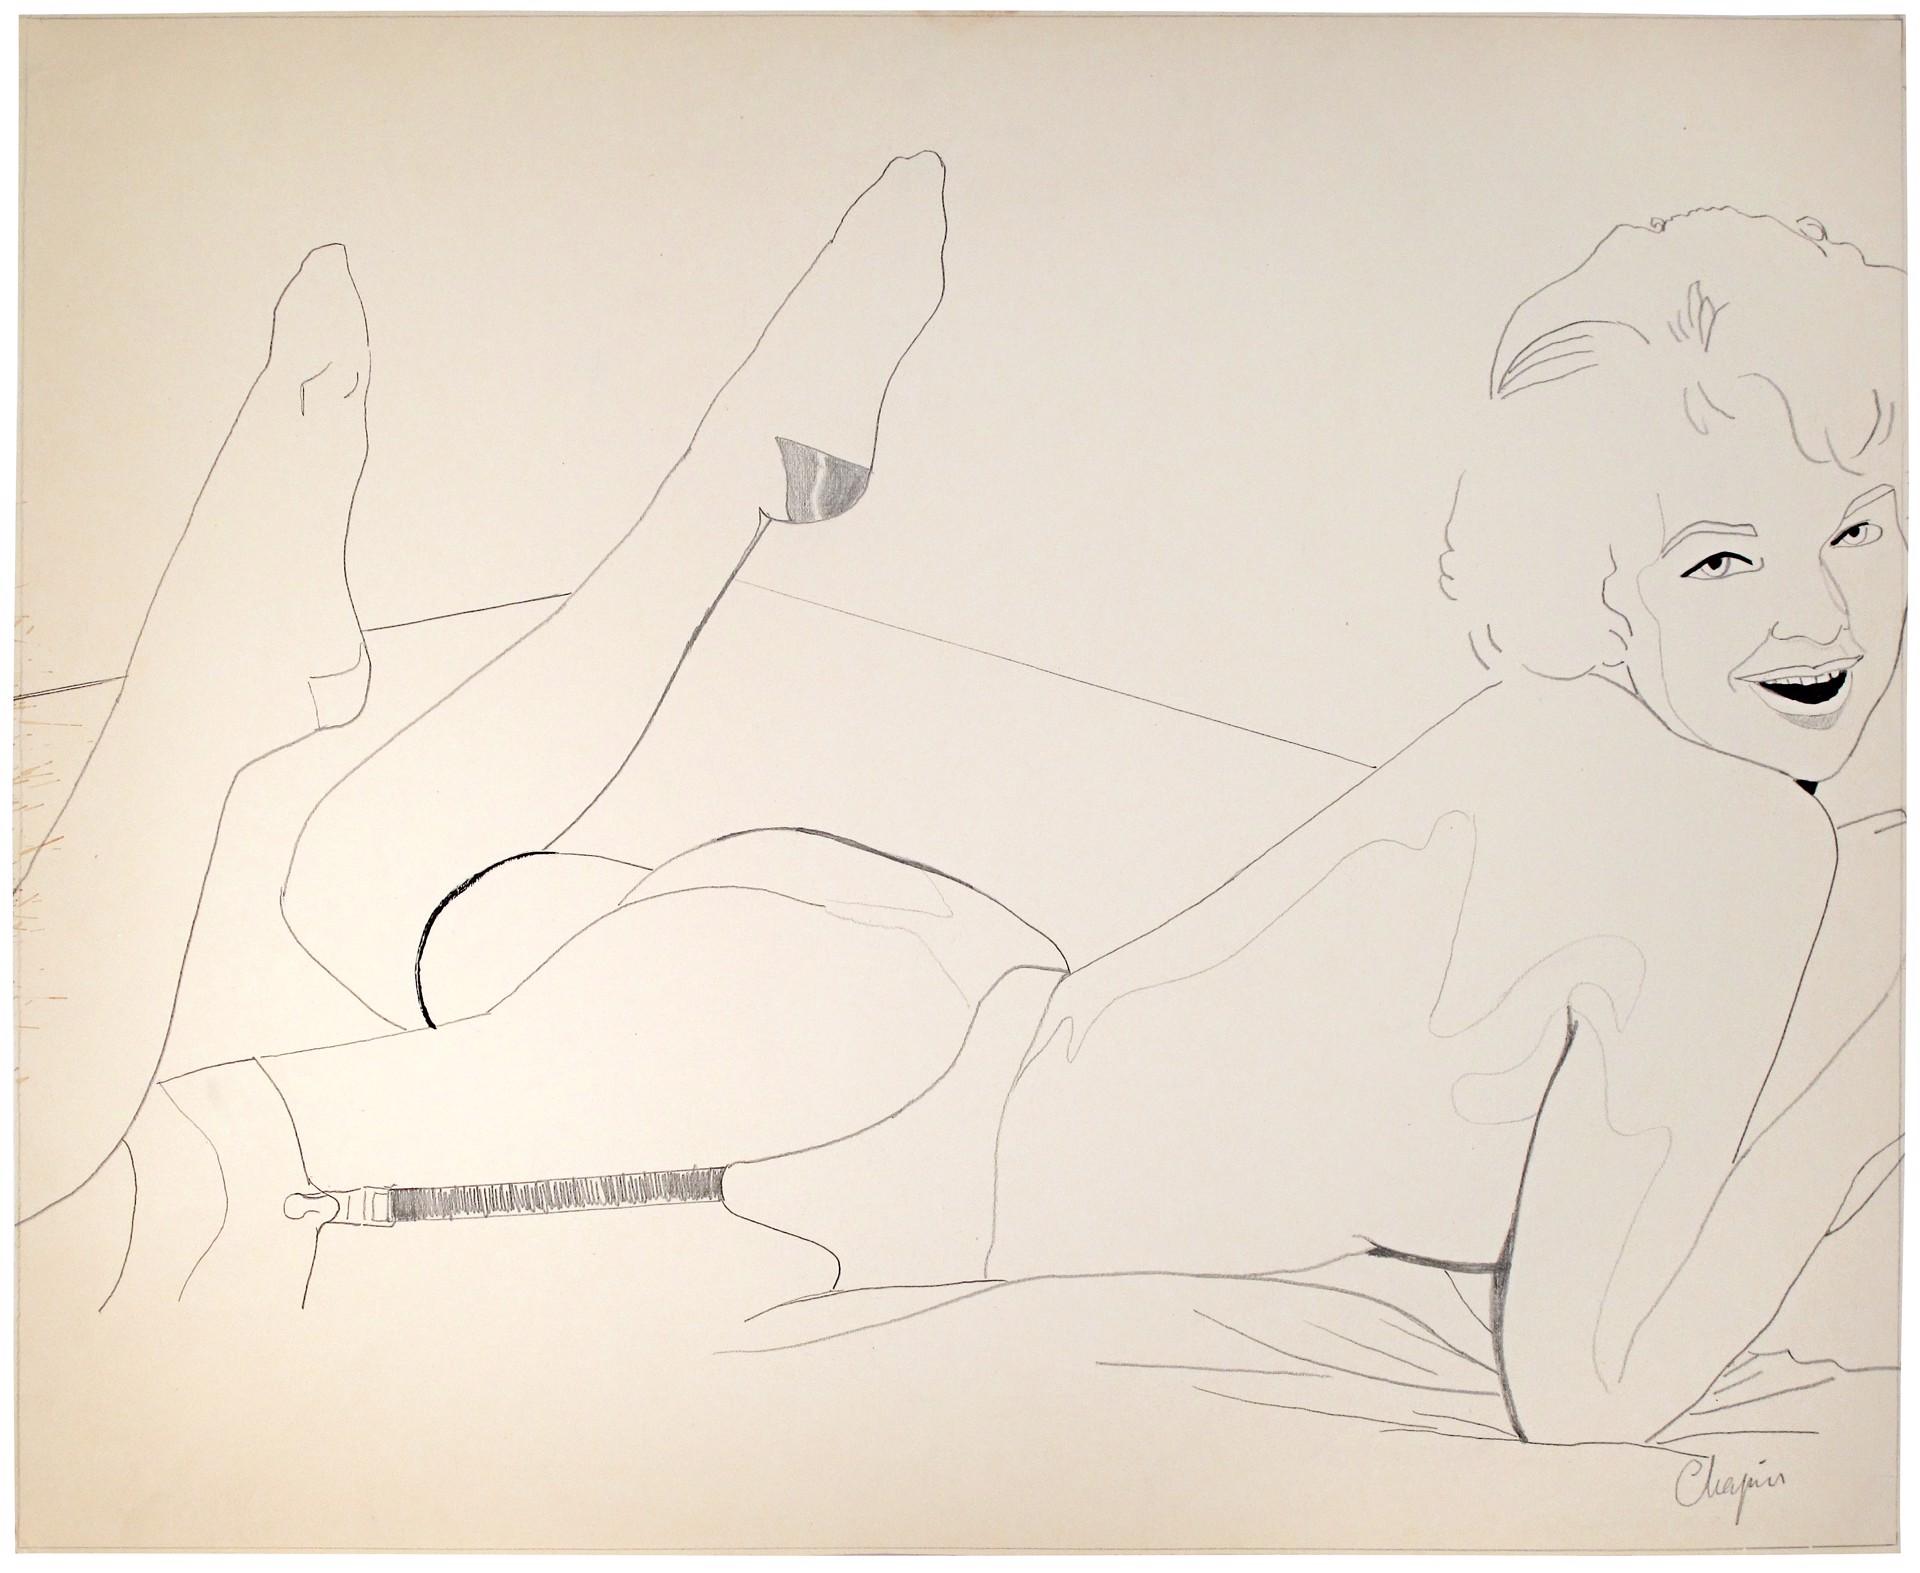 Lying Down, Legs Up by David Chapin